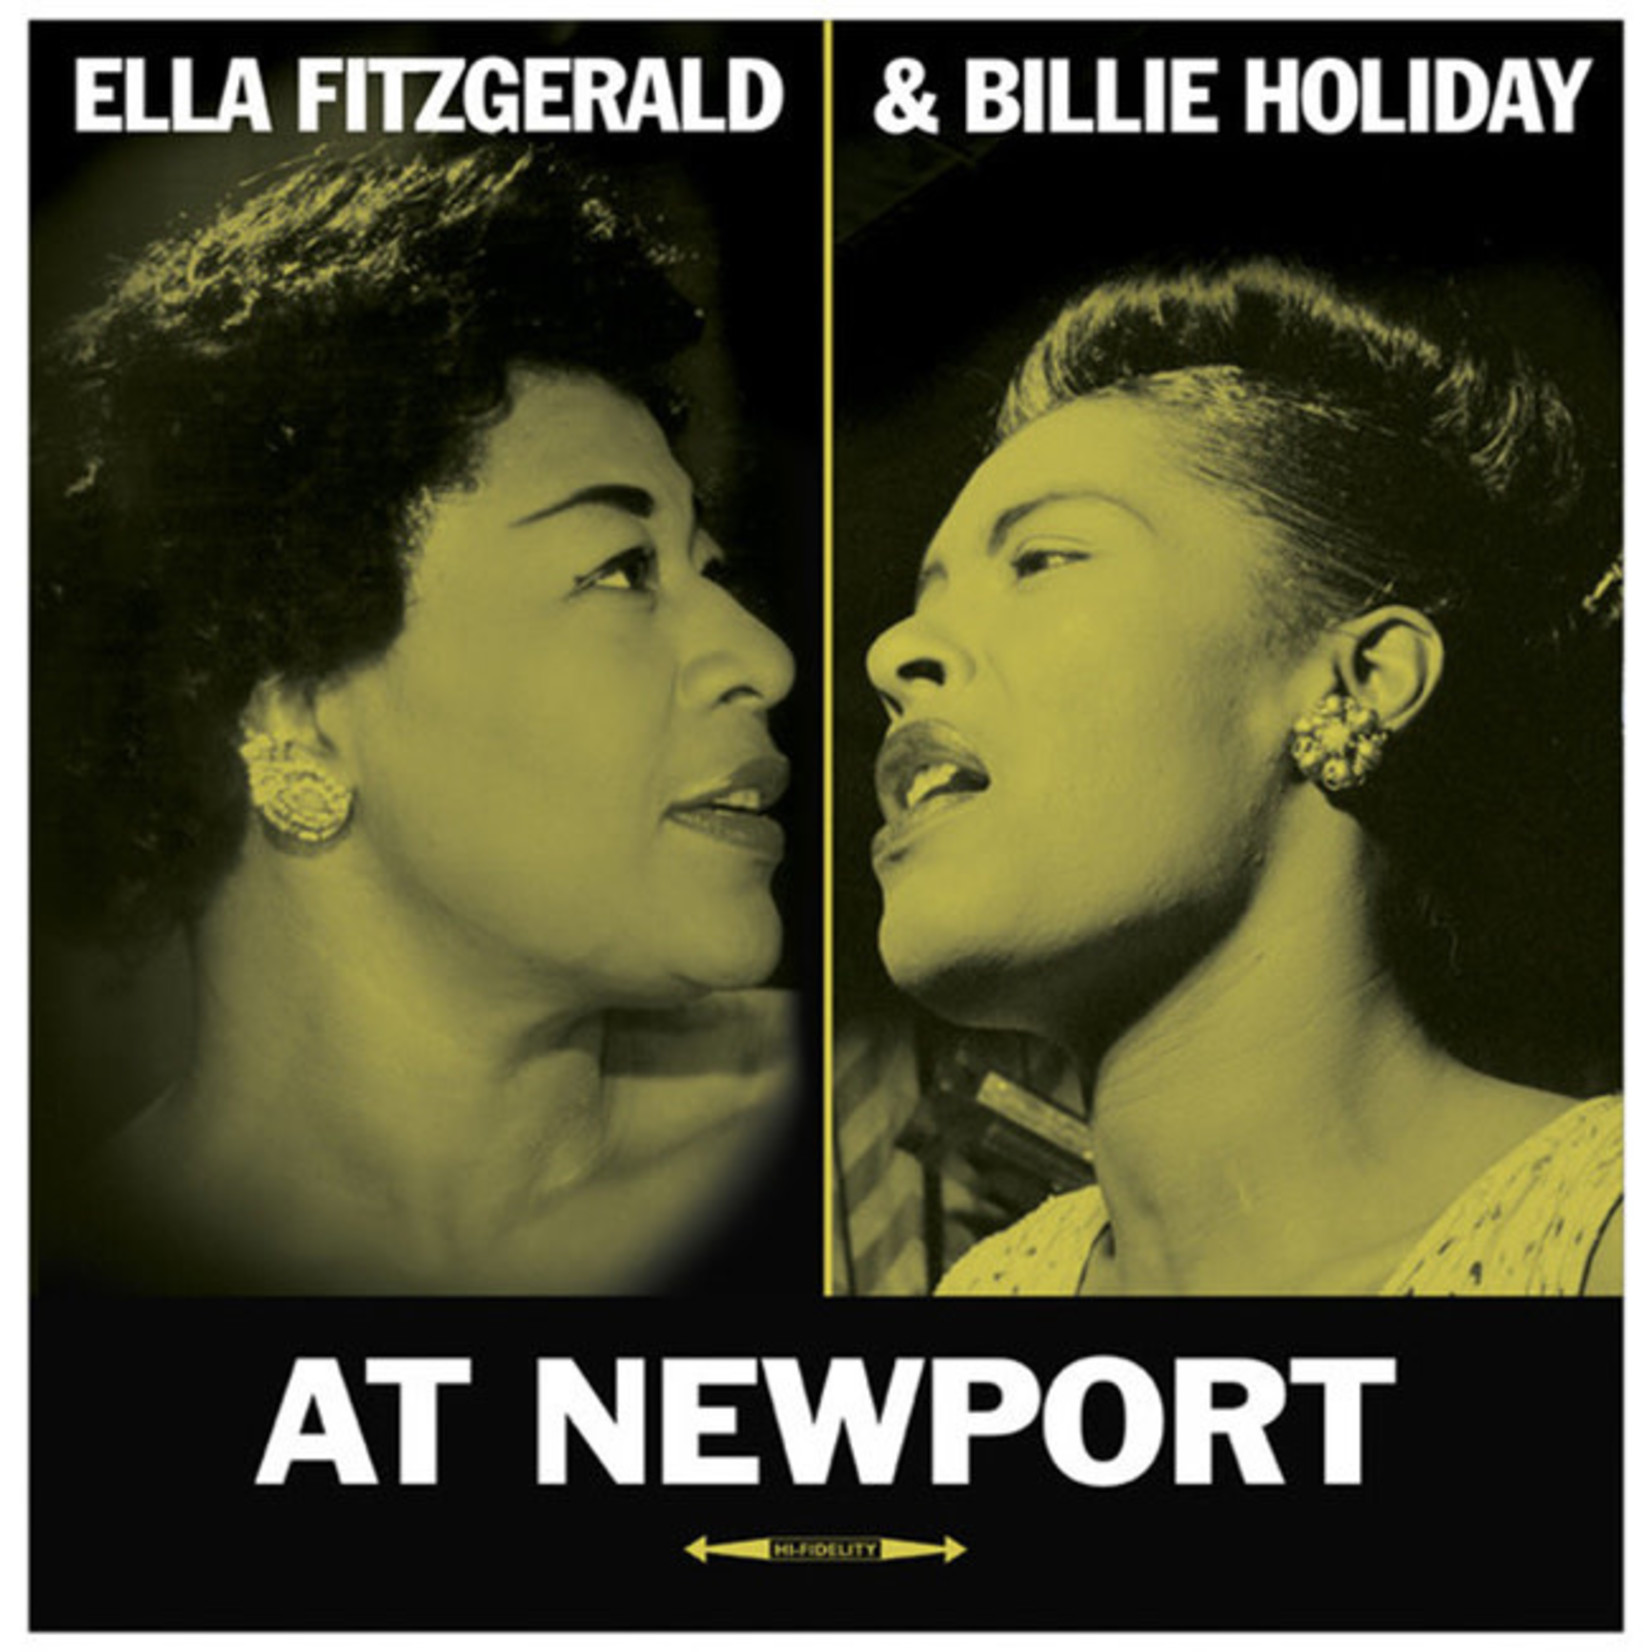 [New] Fitzgerald, Ella & Billie Holiday: At Newport